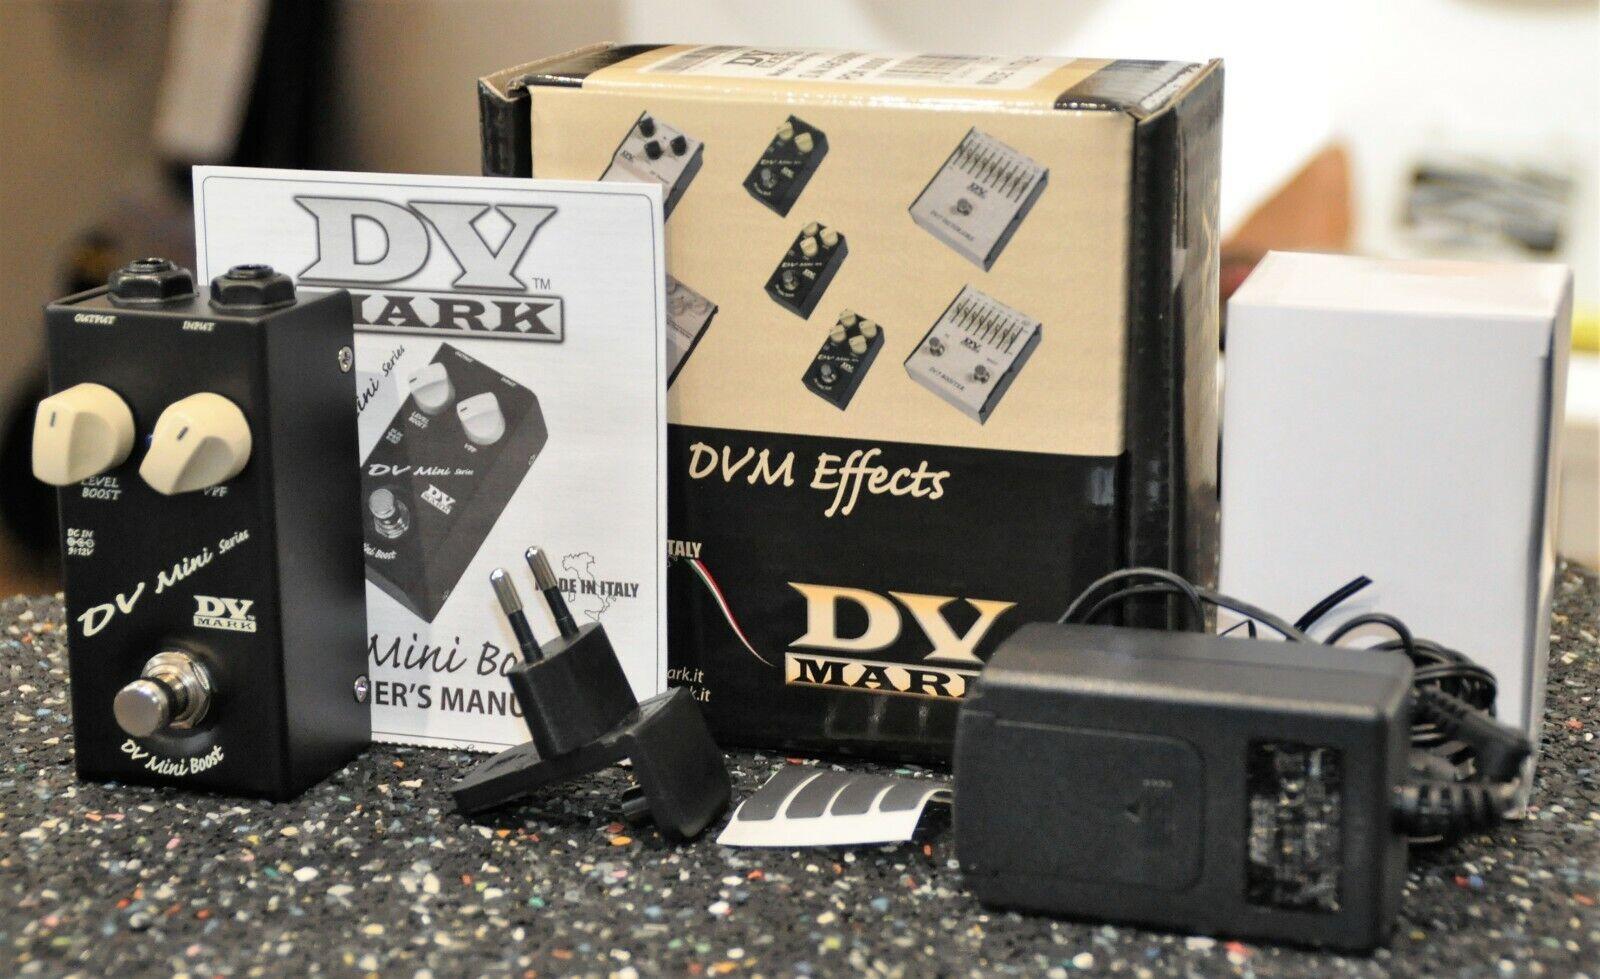 DV Mark DV Mini Boost Ultra Compact Pedal Boost & Preshape Filter -Made in